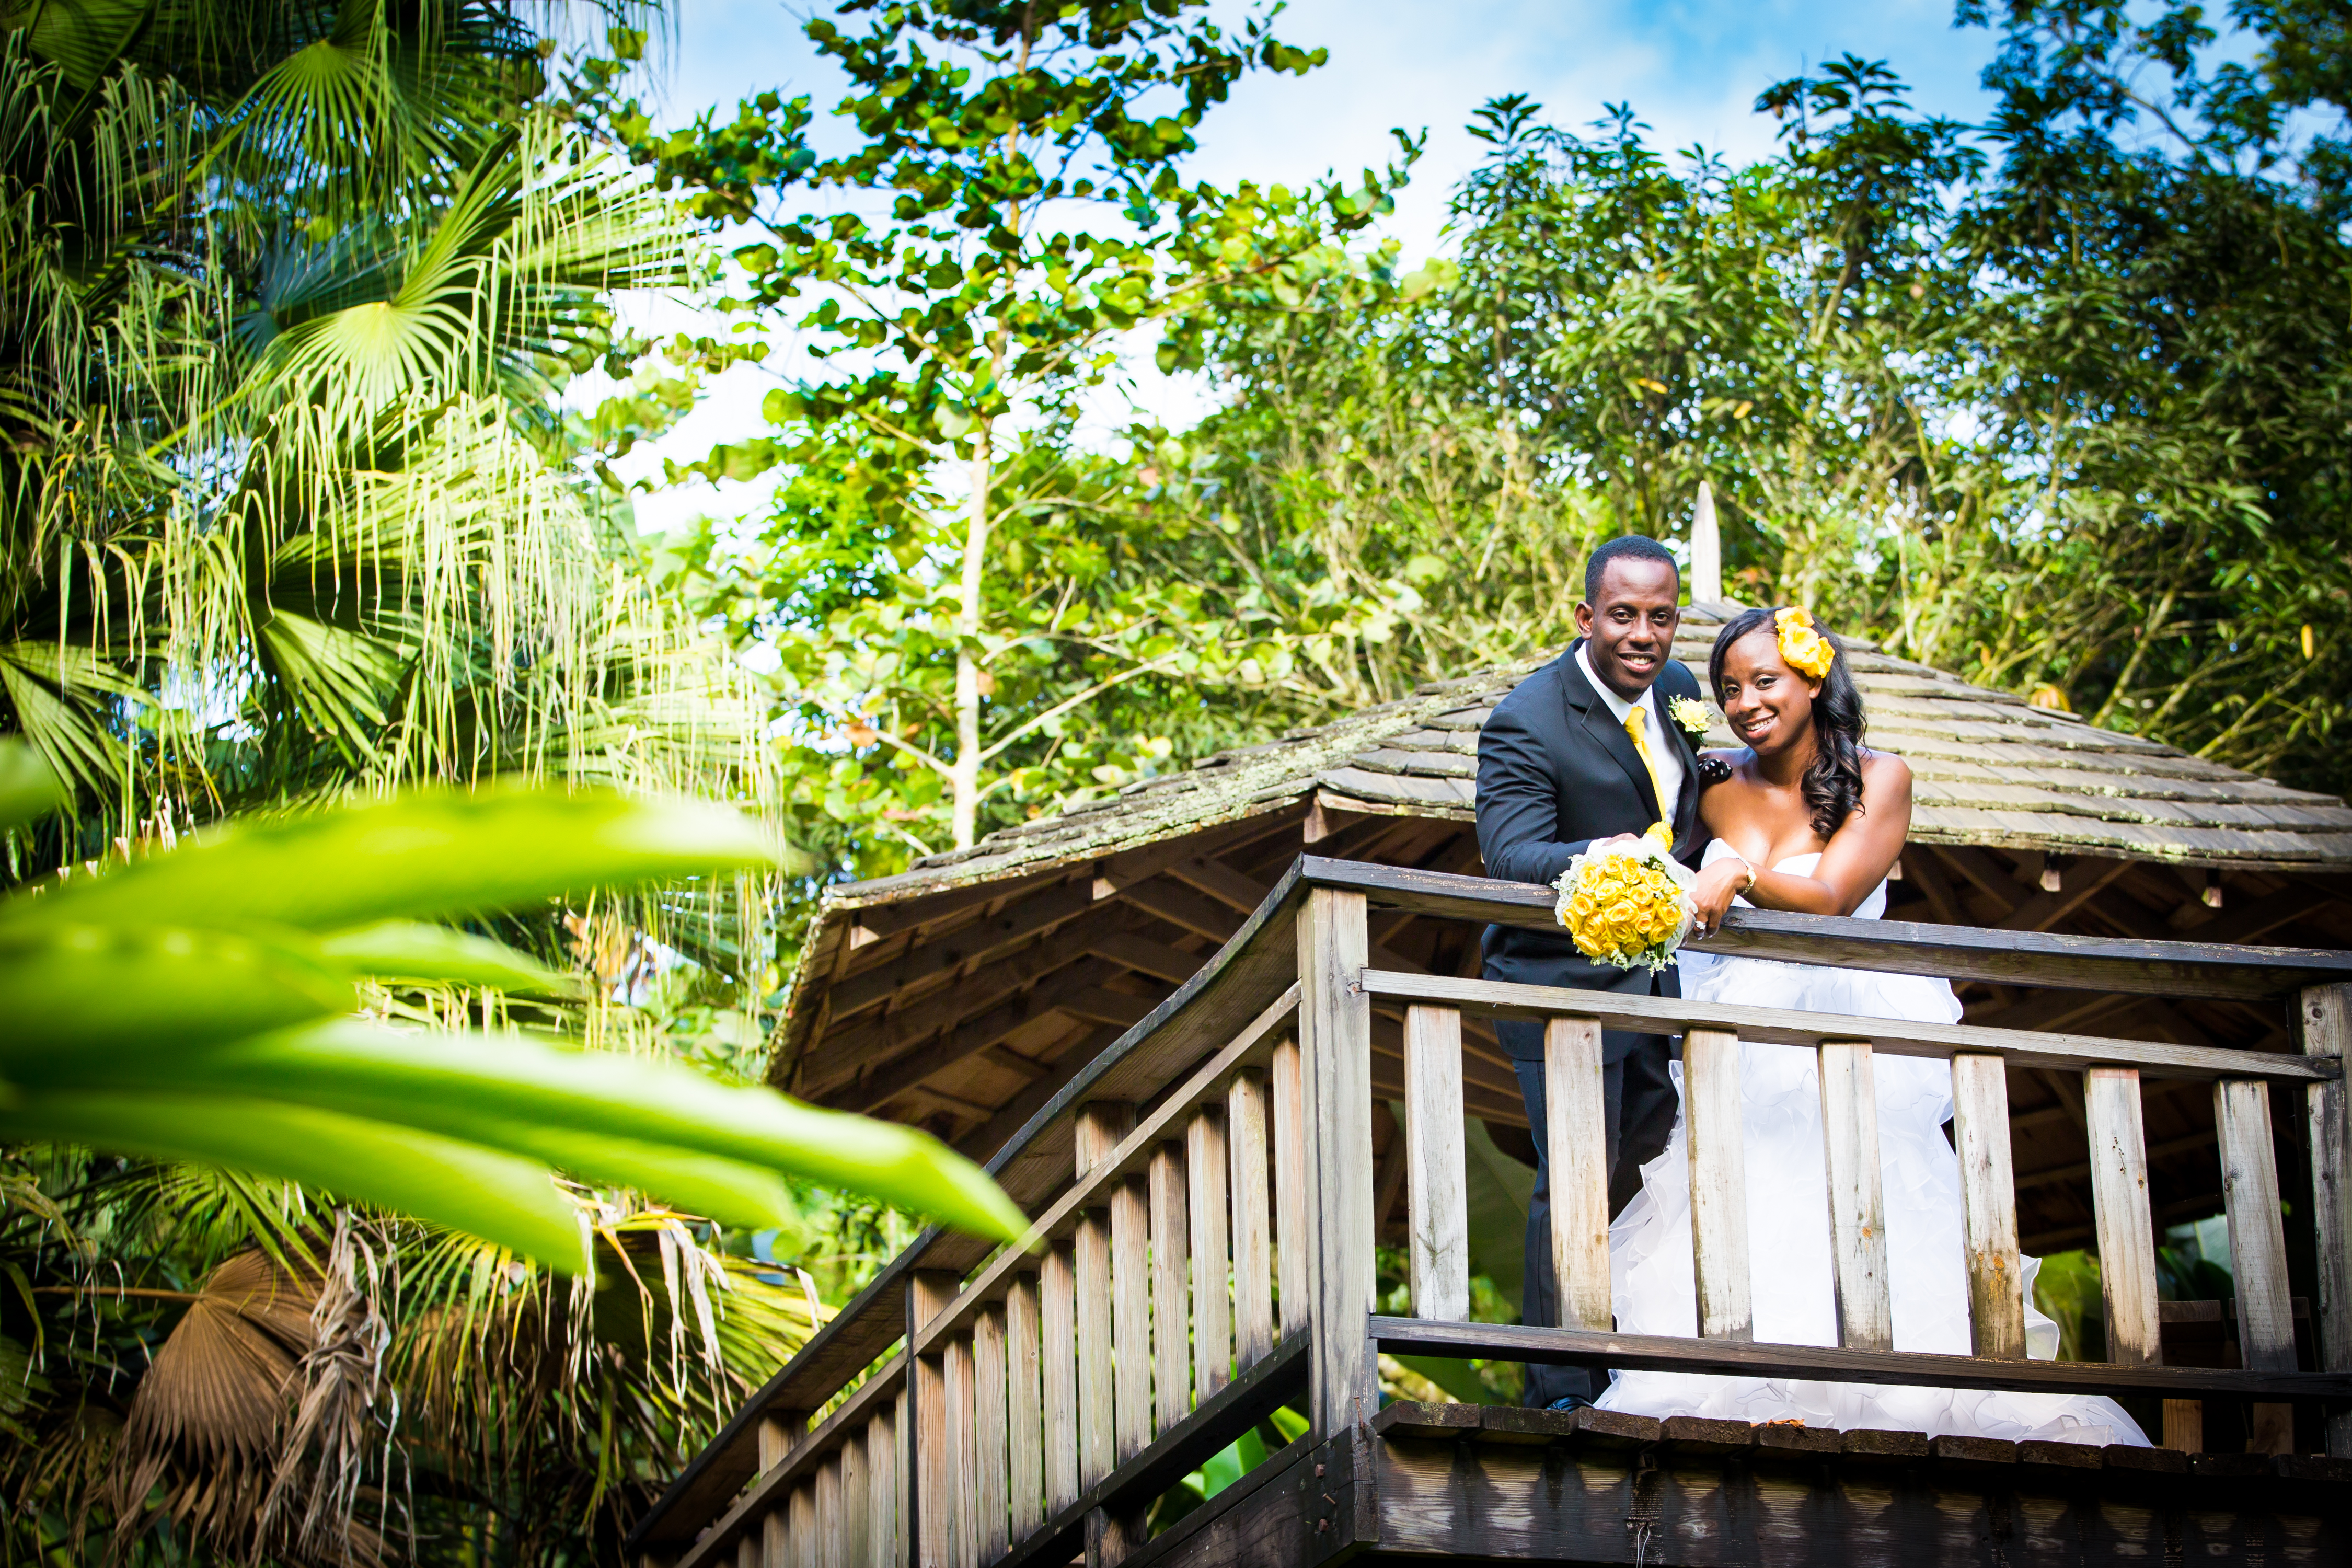 Wedding Struan Castle Garden Tj876 Jamaican Lifestyle